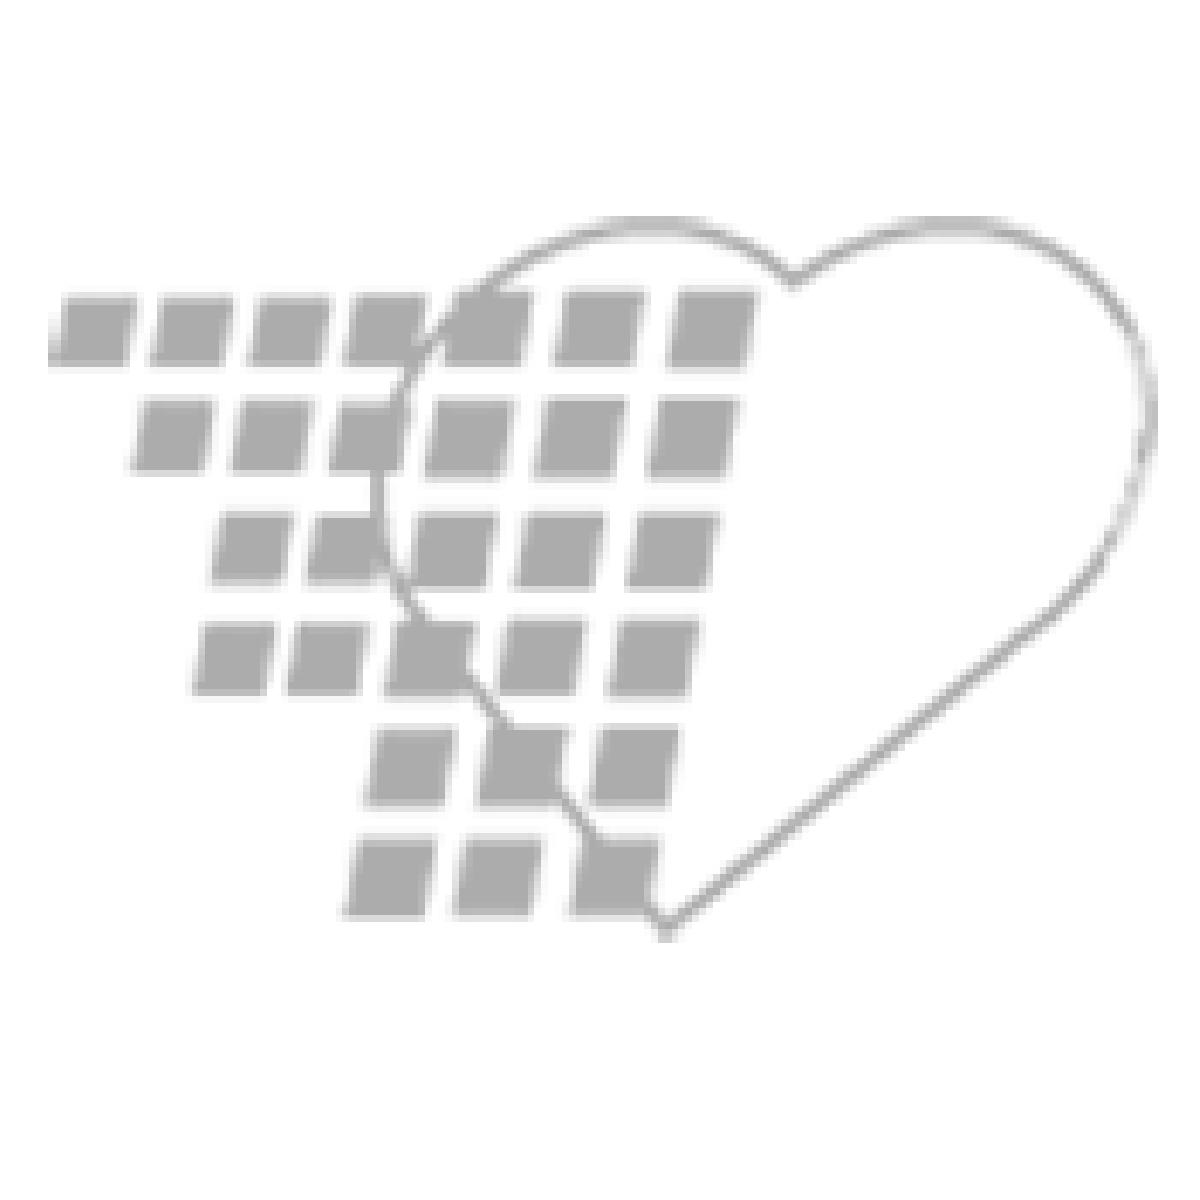 06-93-2020 Demo Dose® 75/25 Insuln 100 units mL 10 mL